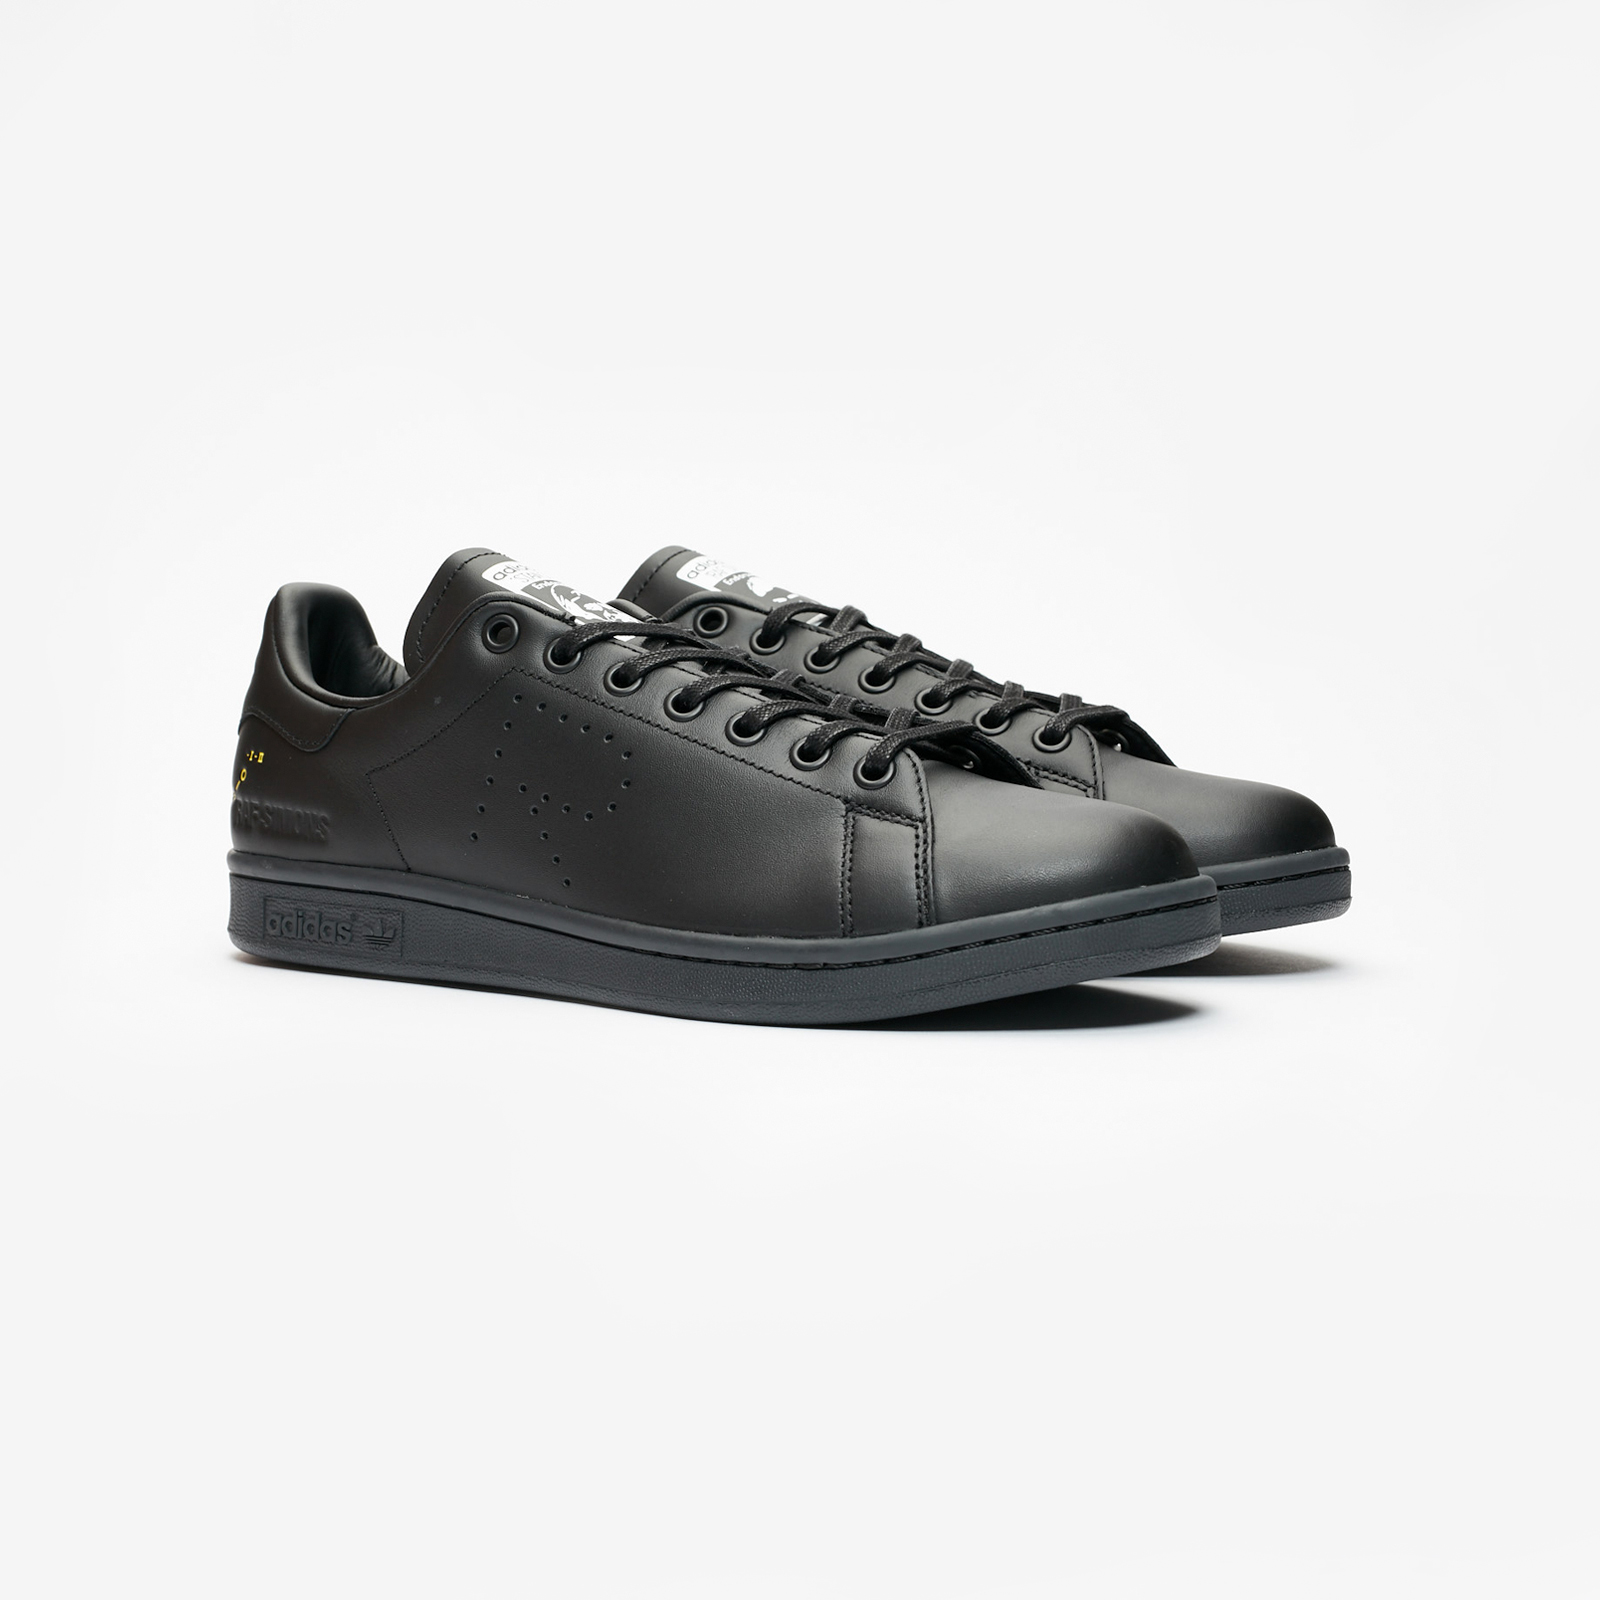 low priced 8c033 c972d adidas Raf Simons Stan Smith - F34257 - Sneakersnstuff ...